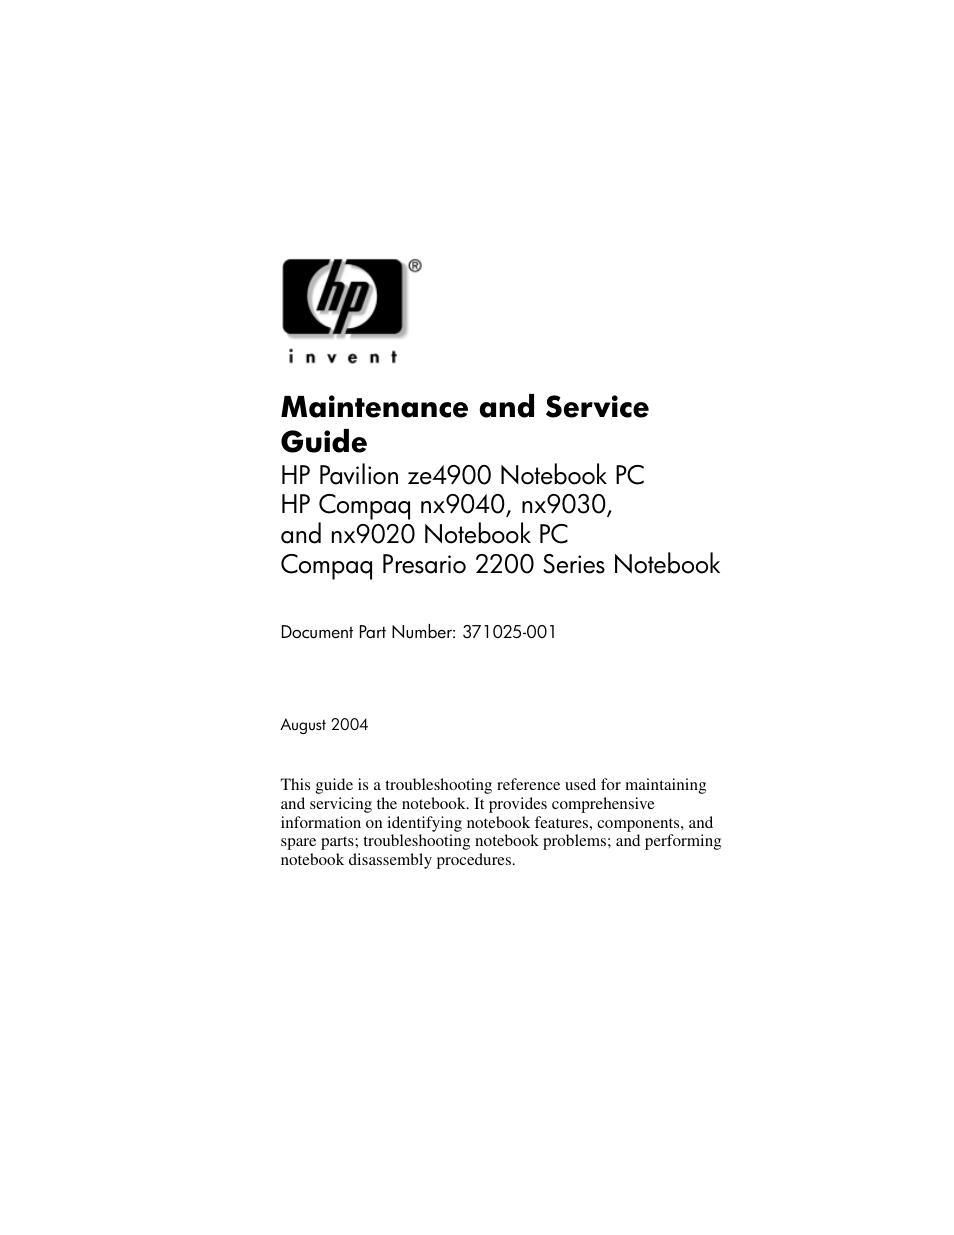 hp ze4900 user manual 182 pages rh manualsdir com Auto Maintenance Guide Tree Maintenance Guide